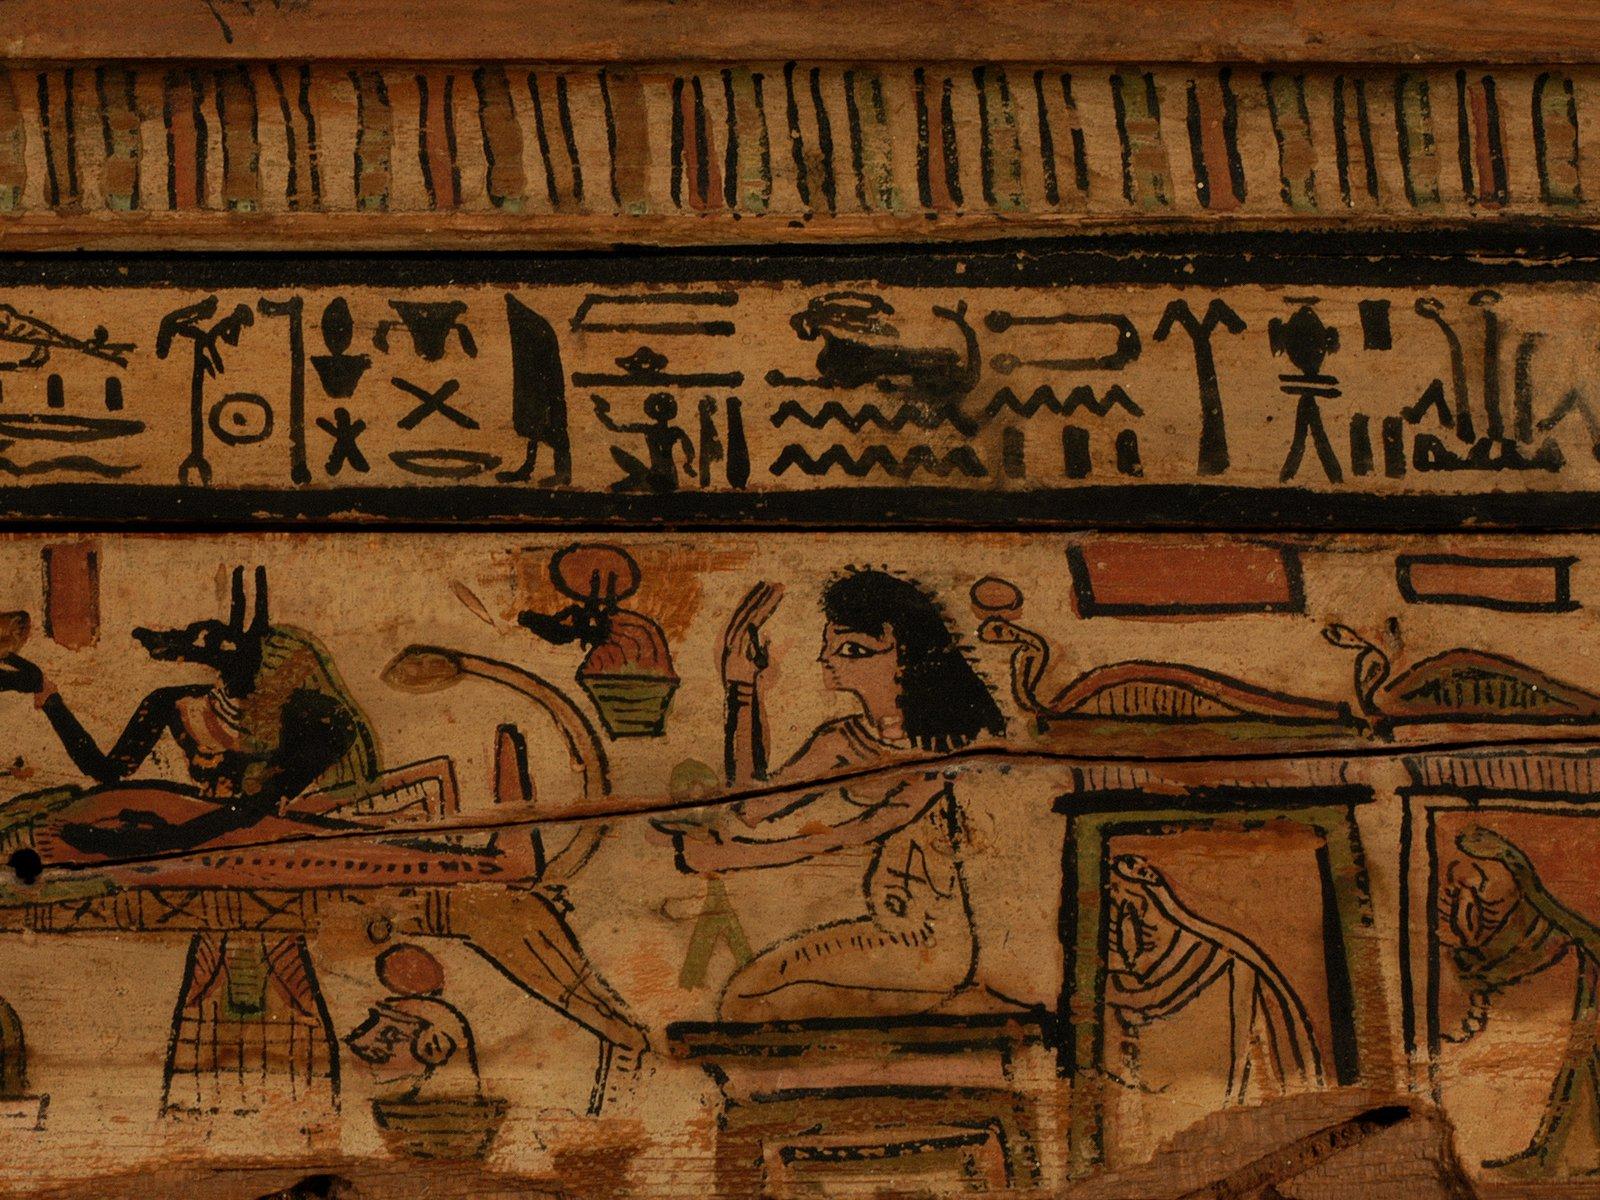 egyptian art influence today